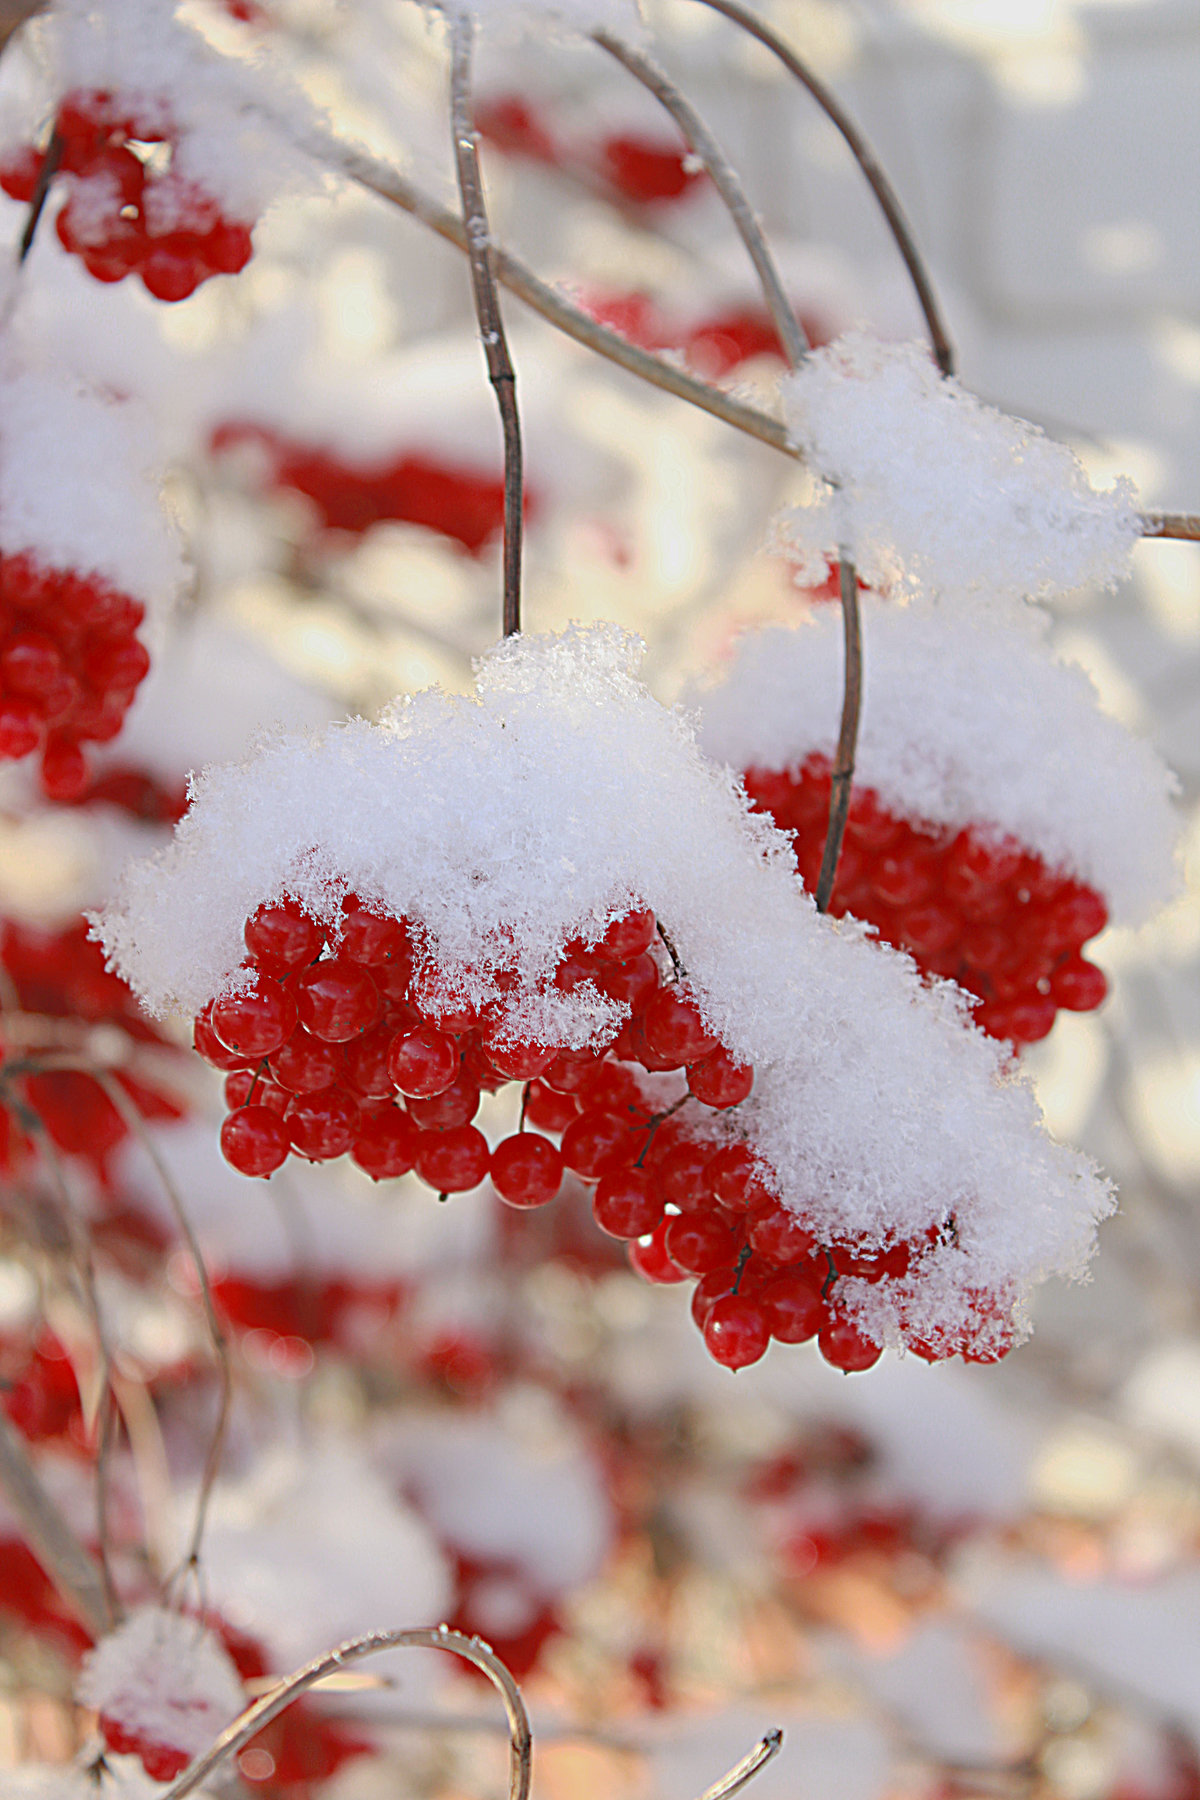 плече картинки зимние красивые на телефон с рябиной вяло